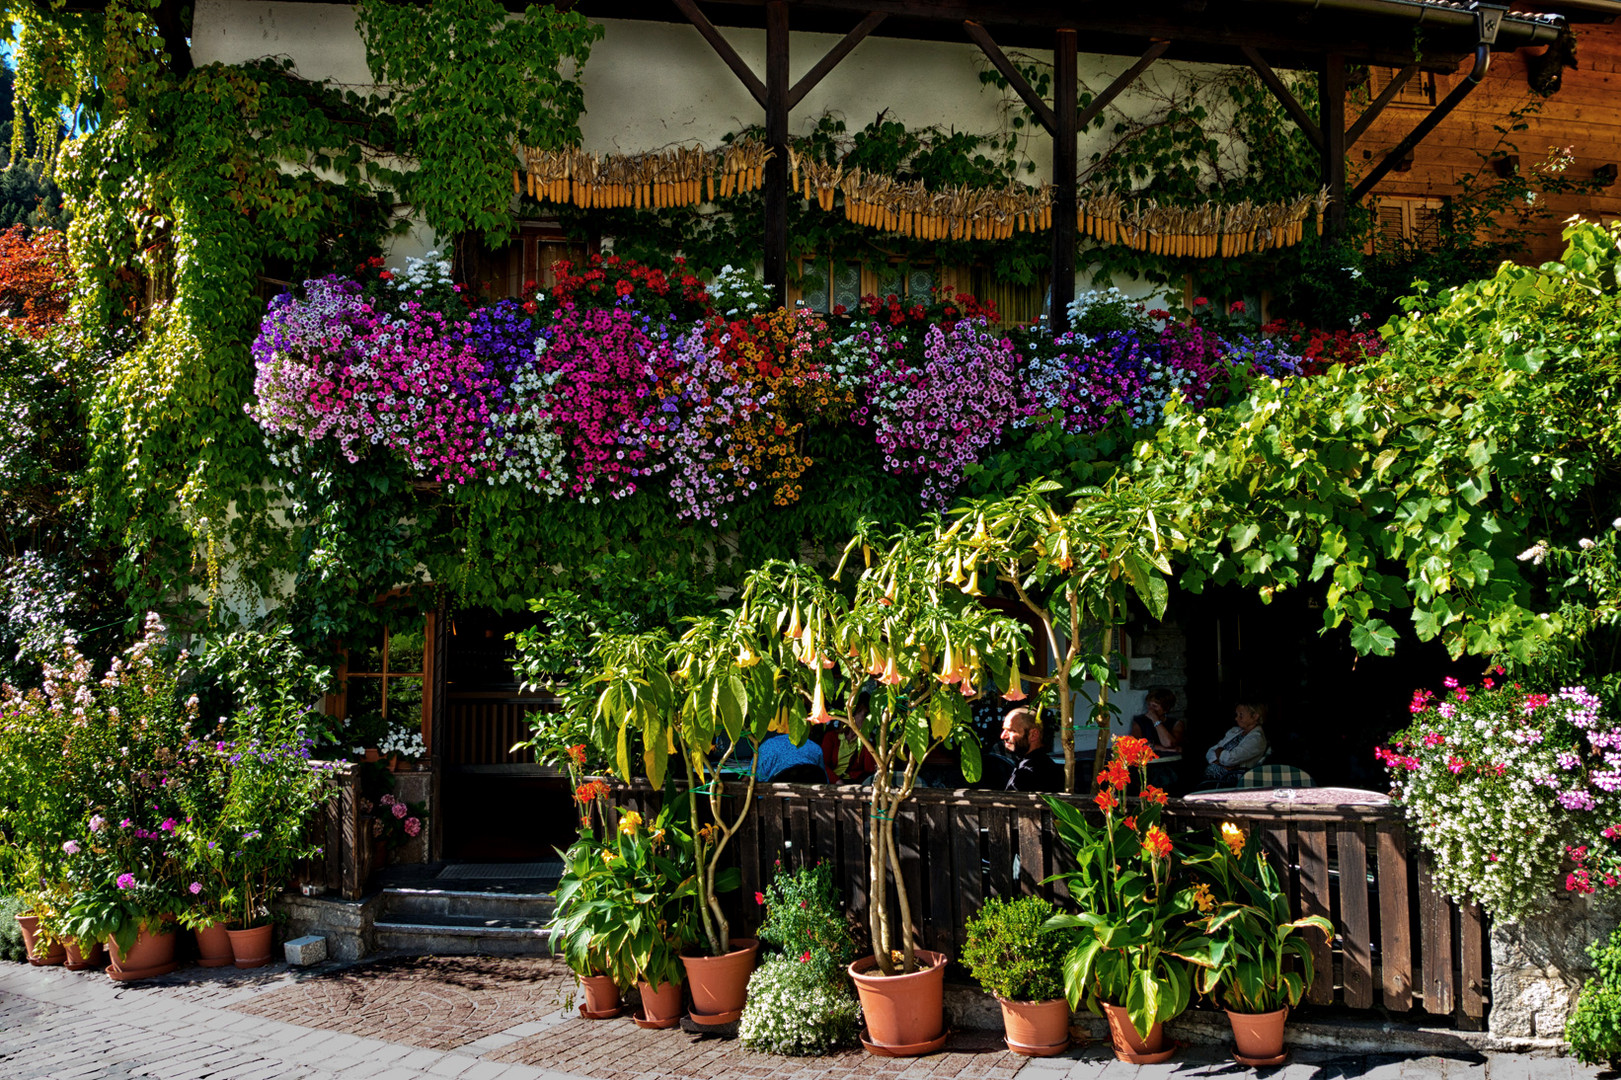 Blütentraum im Passeiertal - I Make a Break